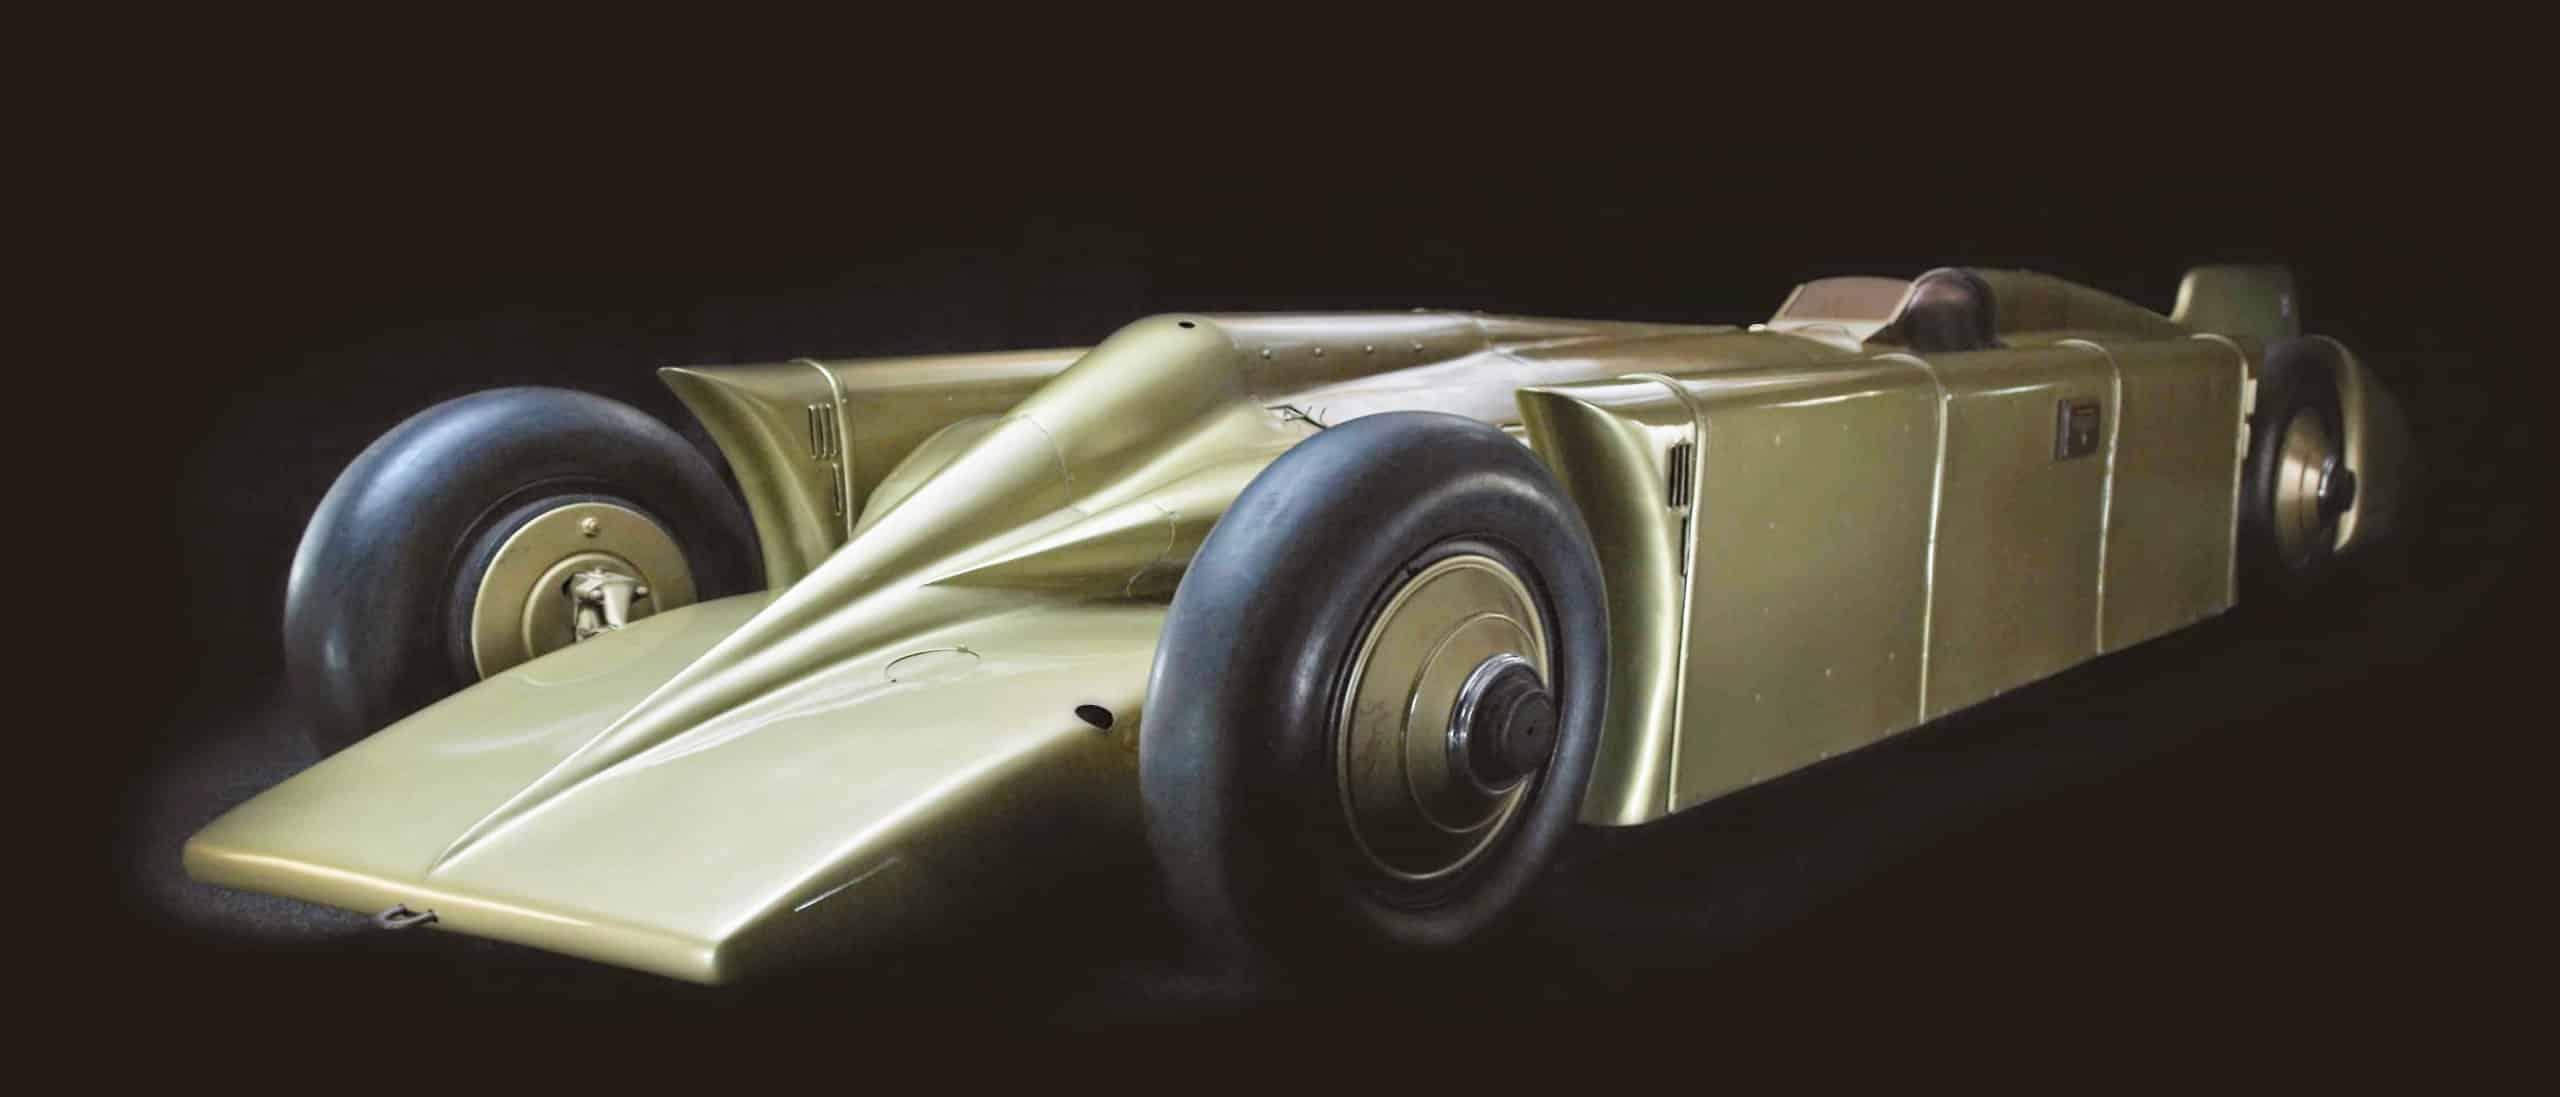 Corvette, Corvette designer helps museum curate 'Big Daddy' Roth exhibition, ClassicCars.com Journal